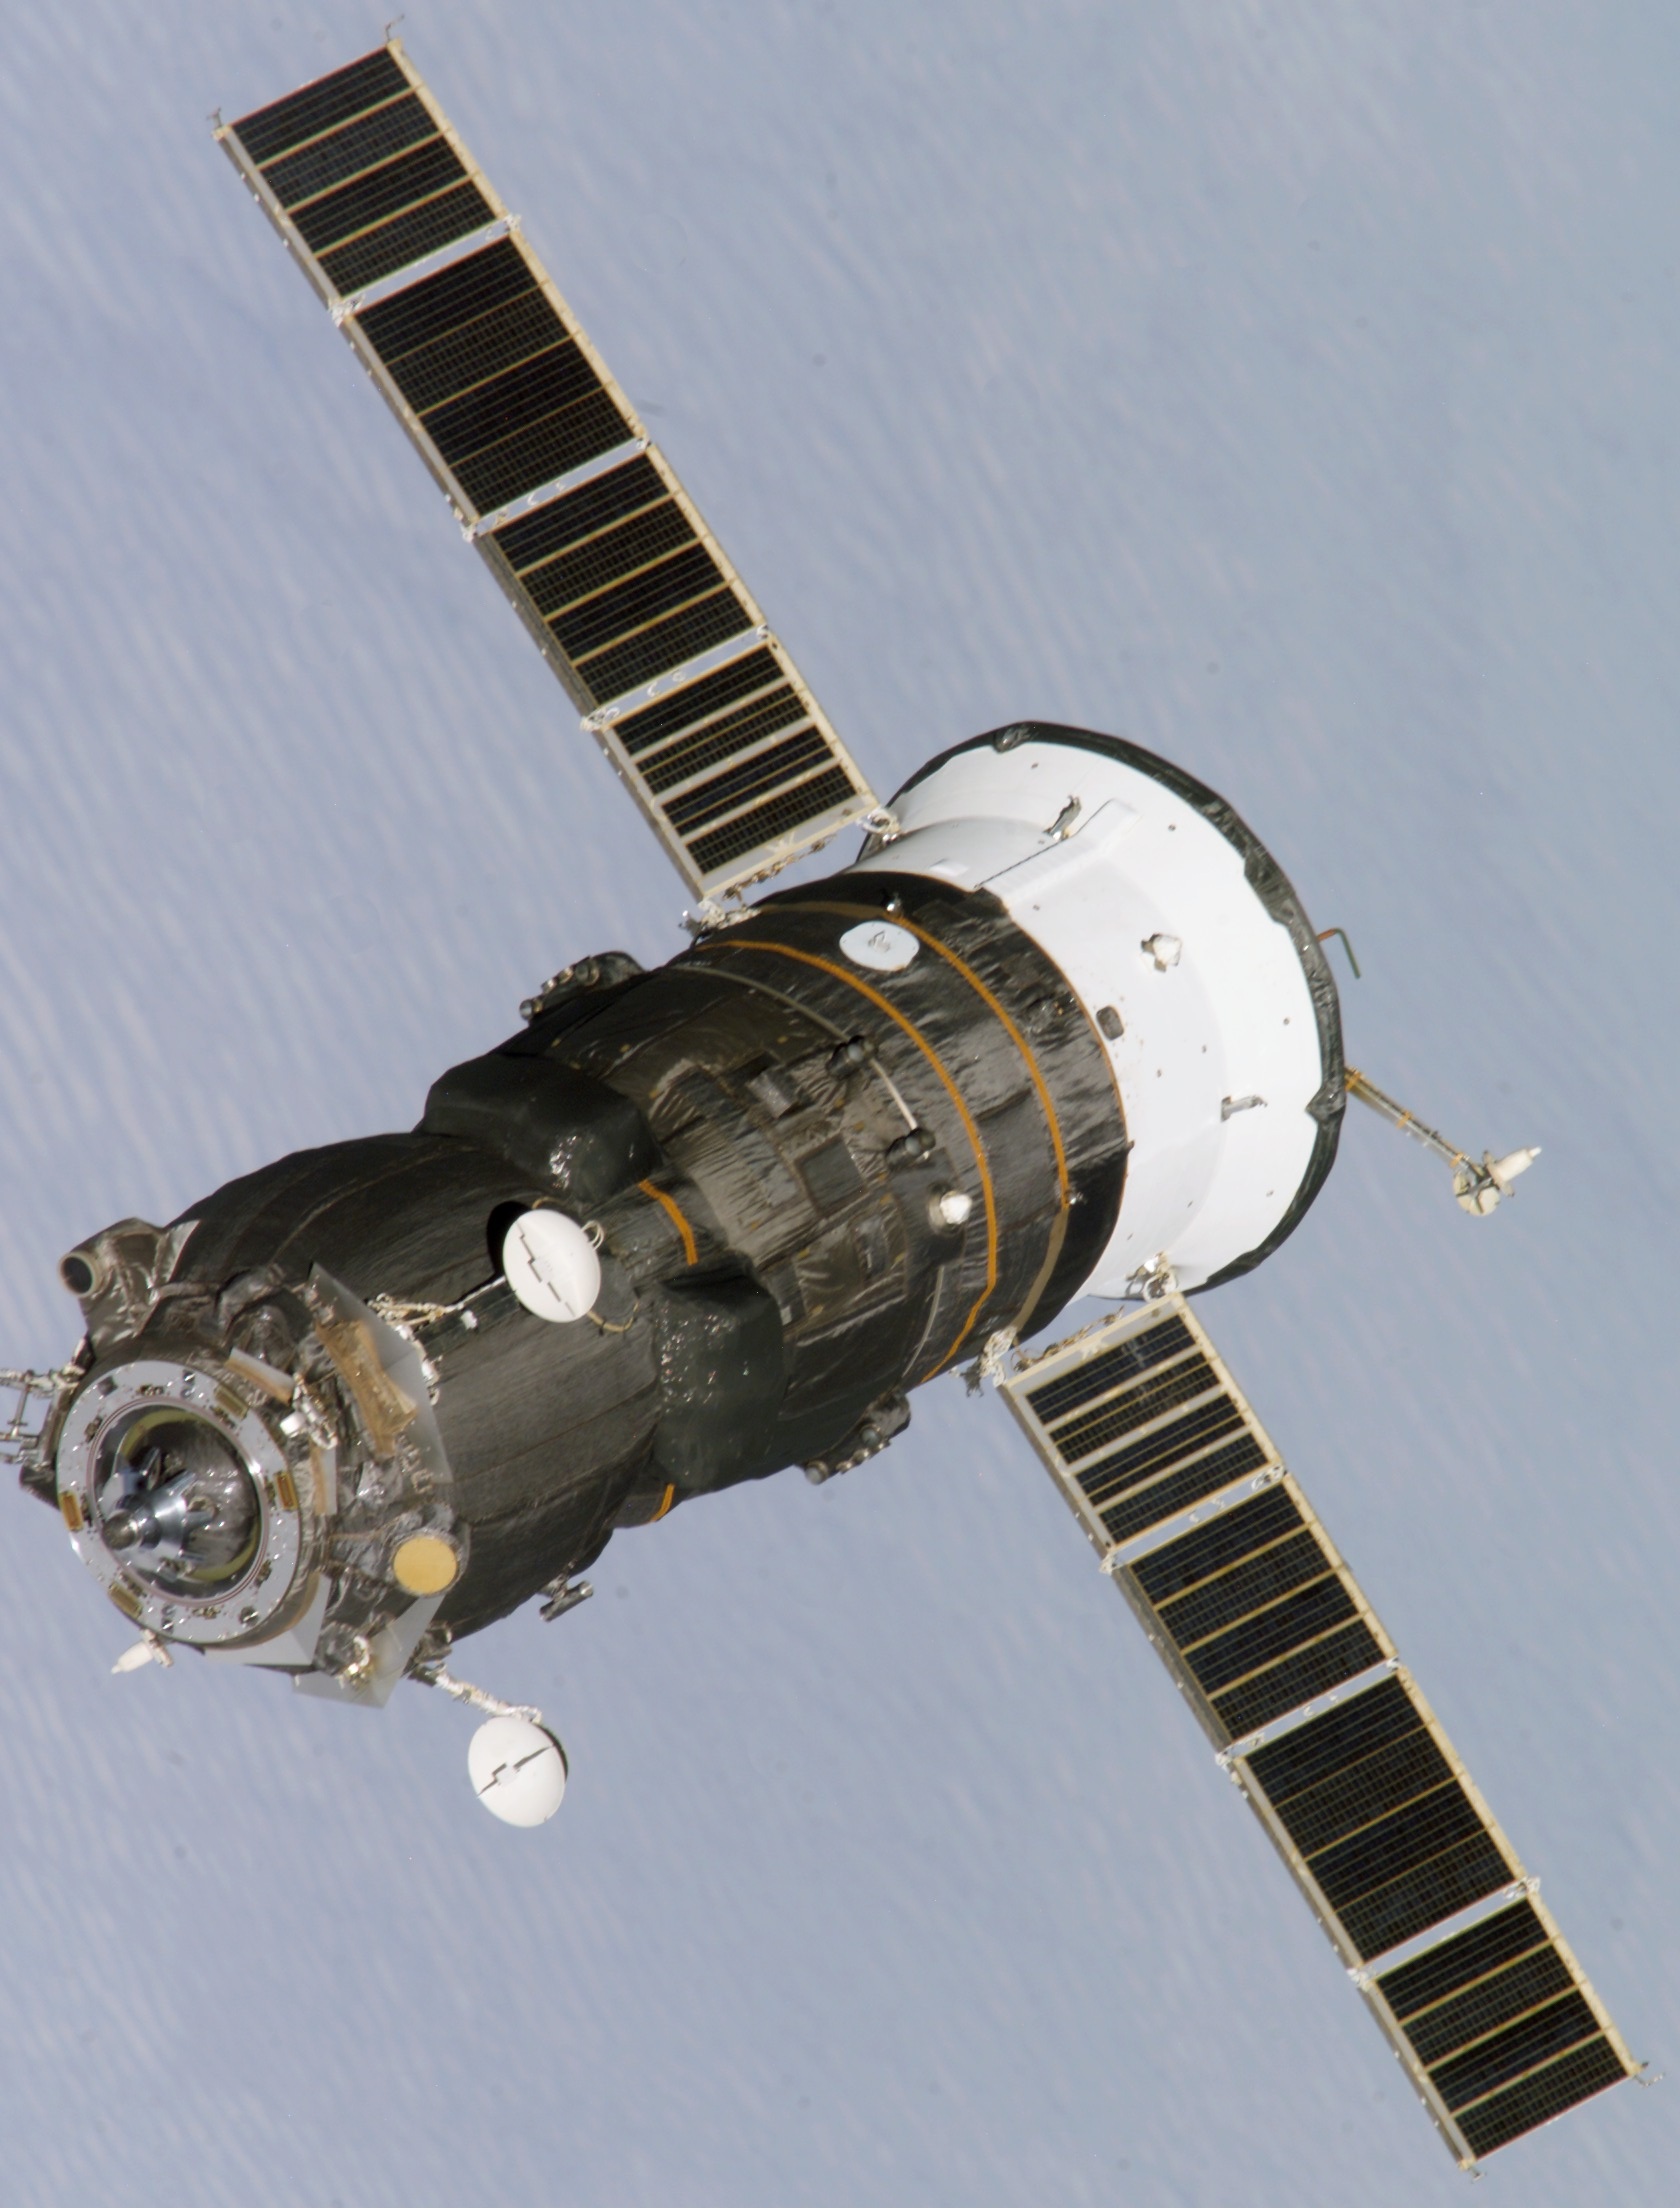 ISS_Progress_cargo_spacecraft.jpg